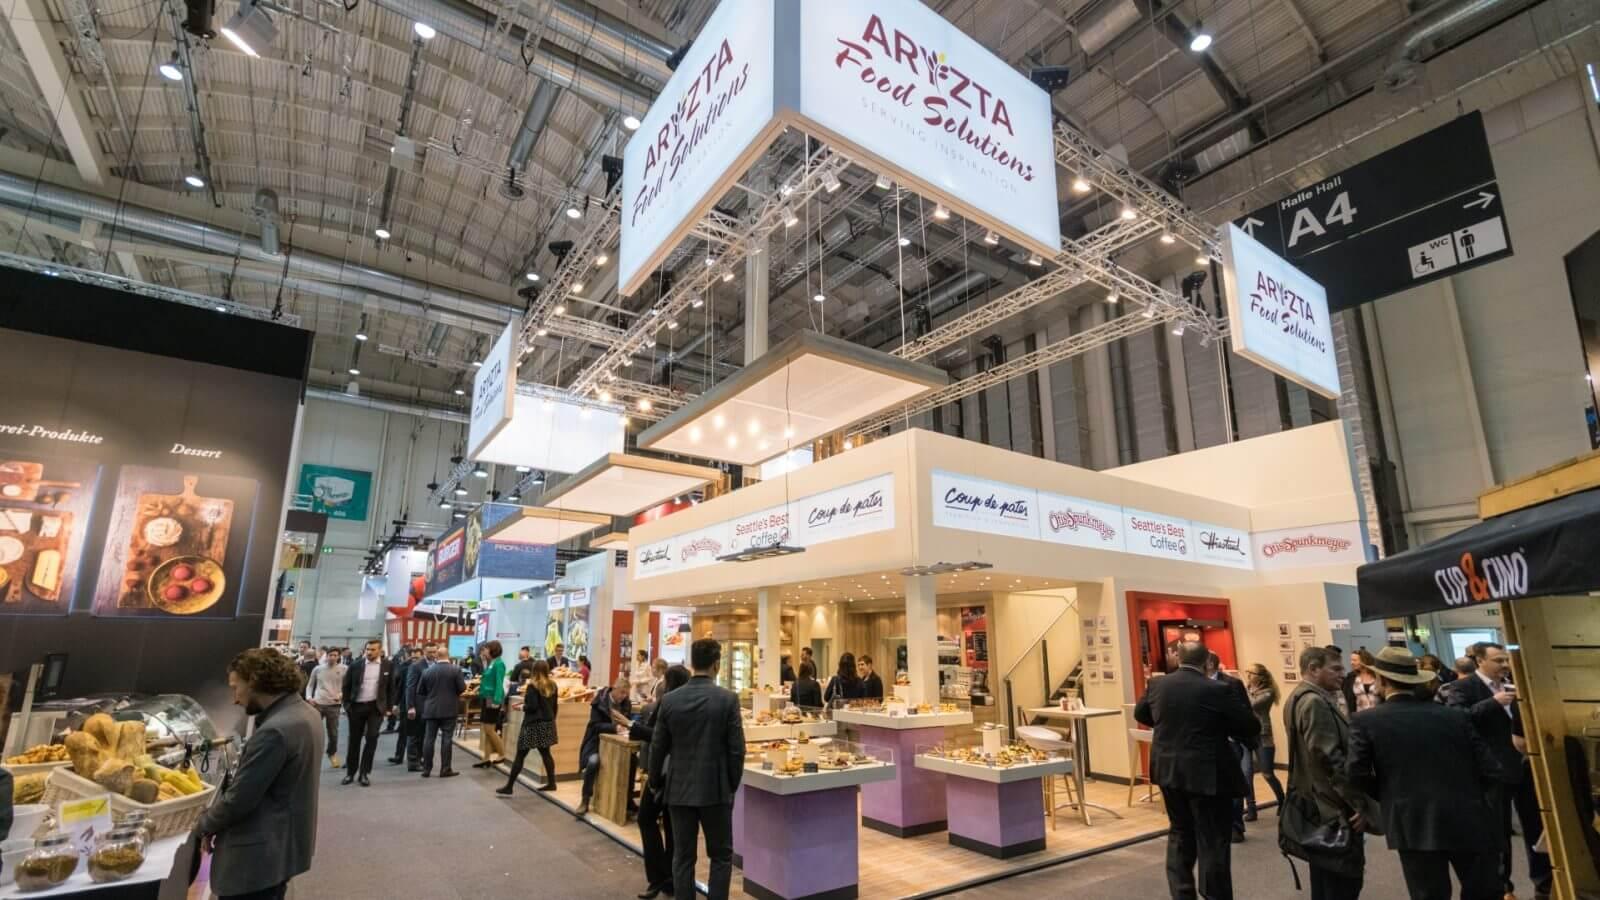 ARYZTA<br>218 m² Doppelstock<br>INTERNORGA